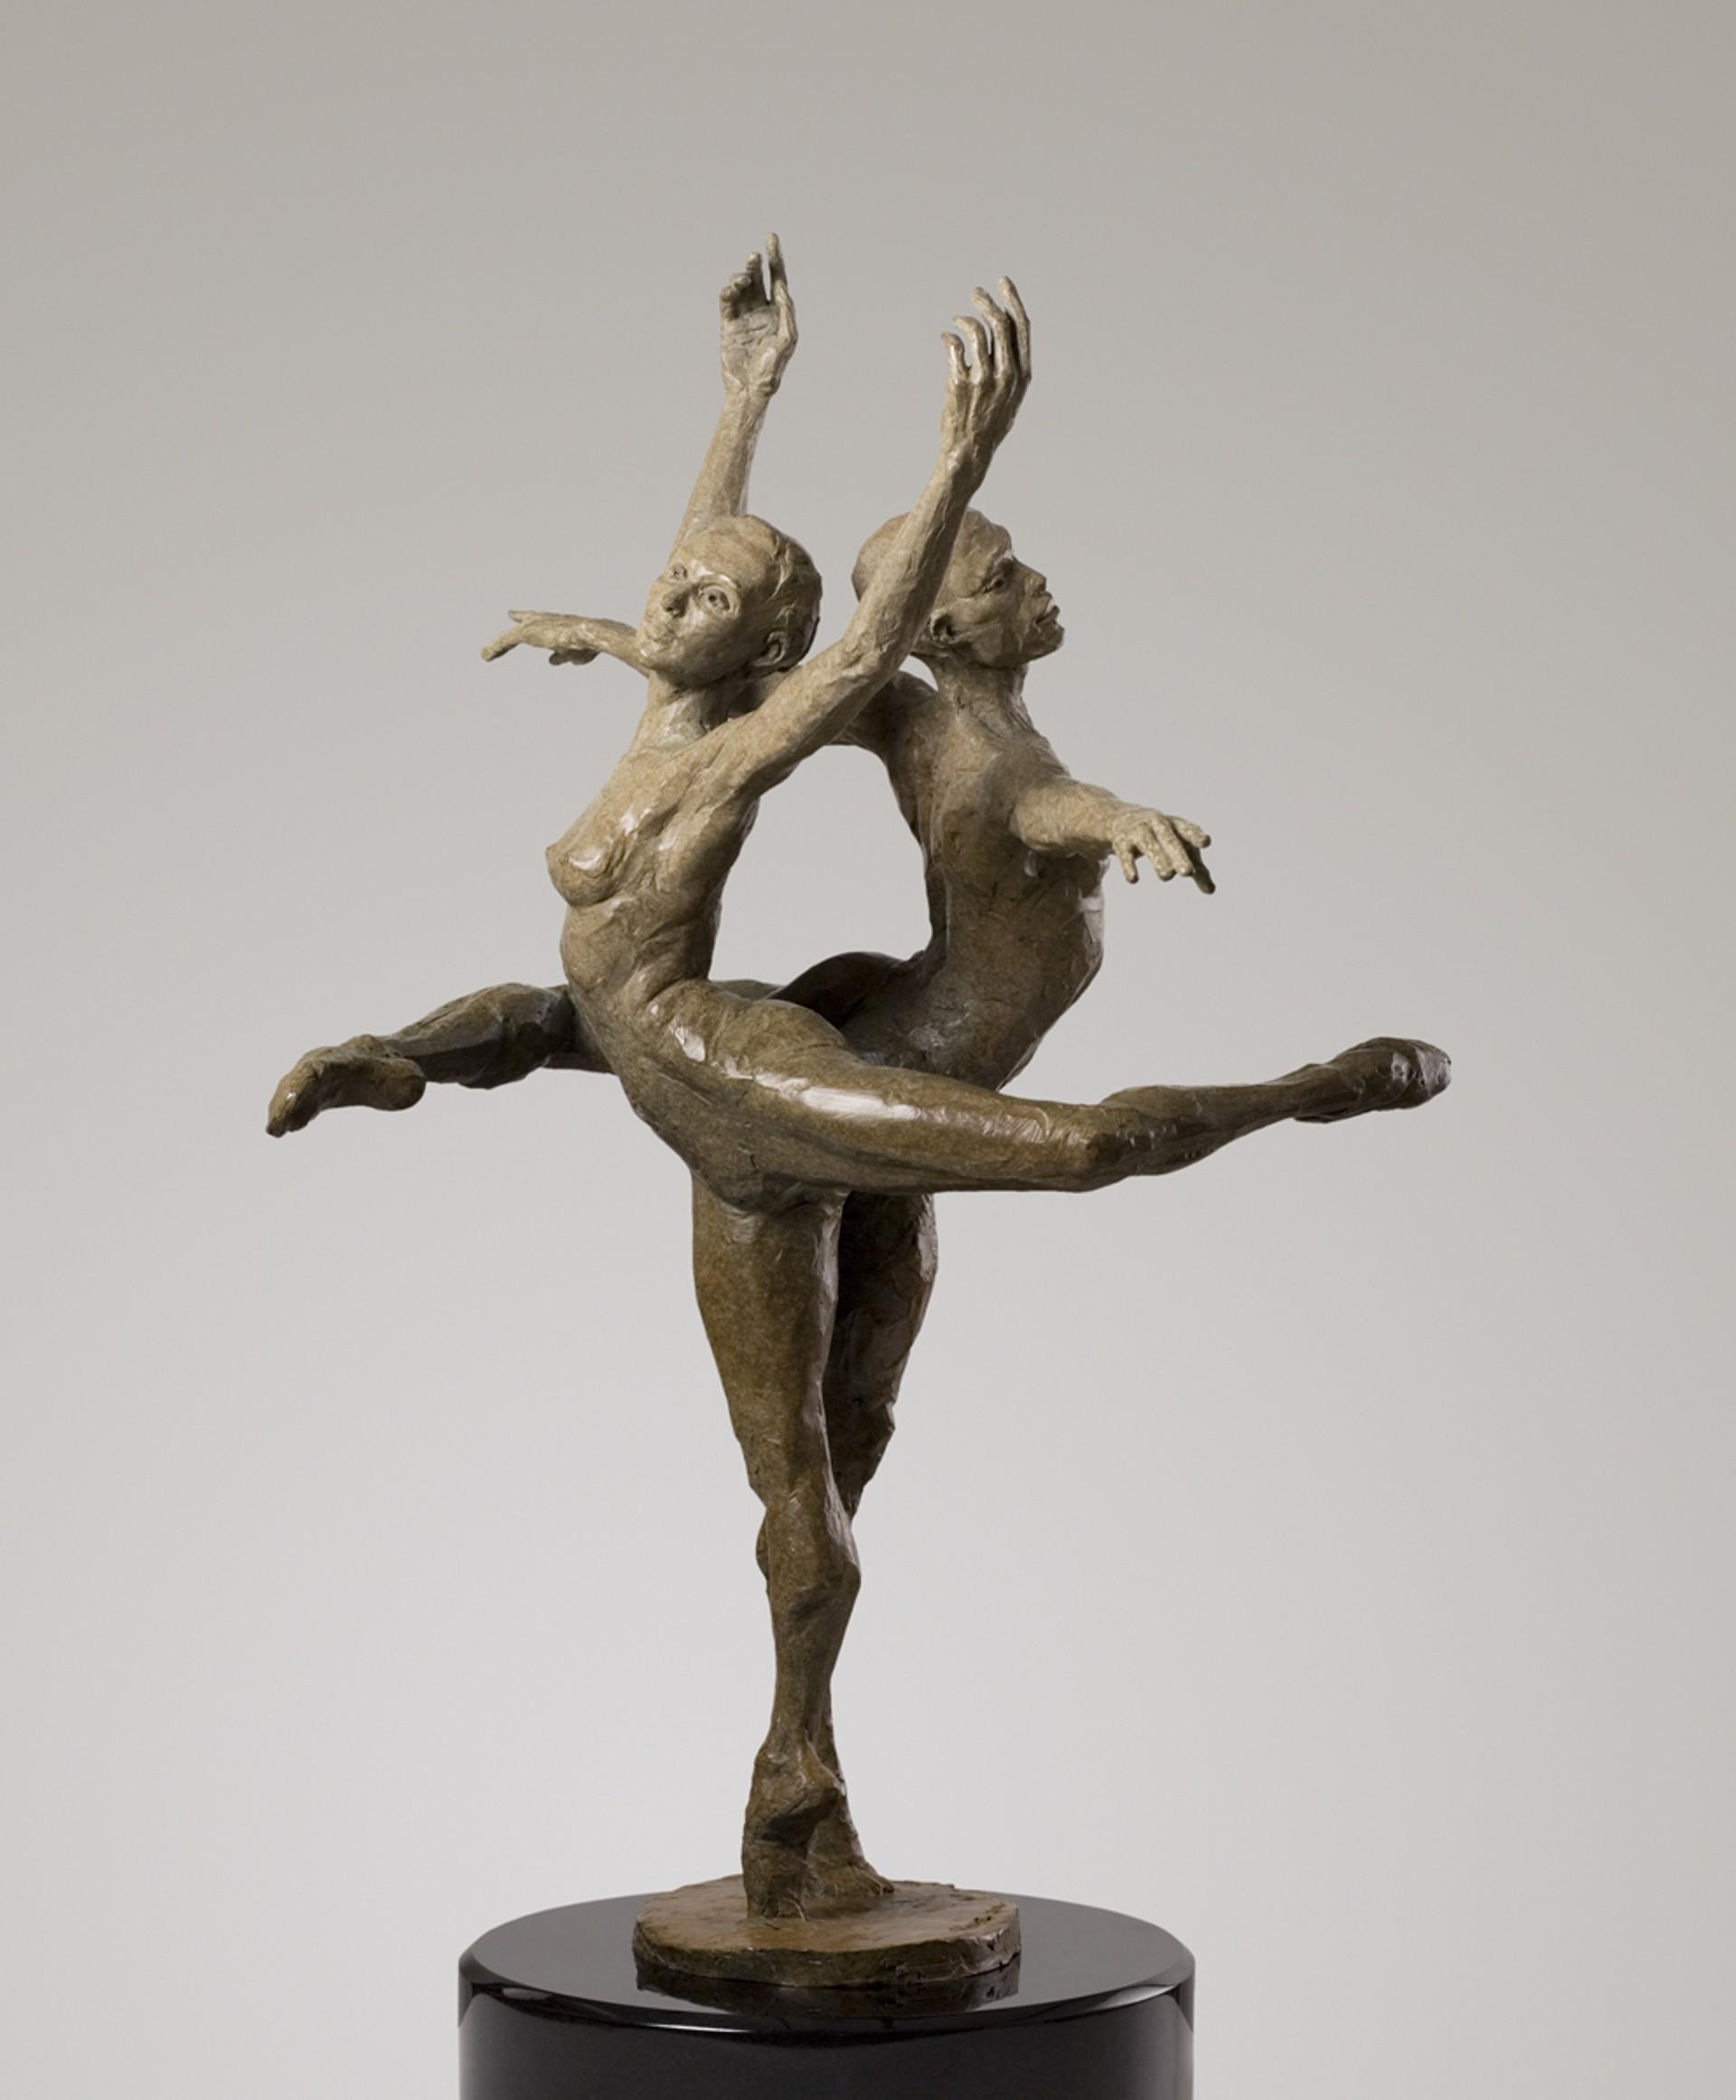 Harmony, The Dancers by Paige Bradley